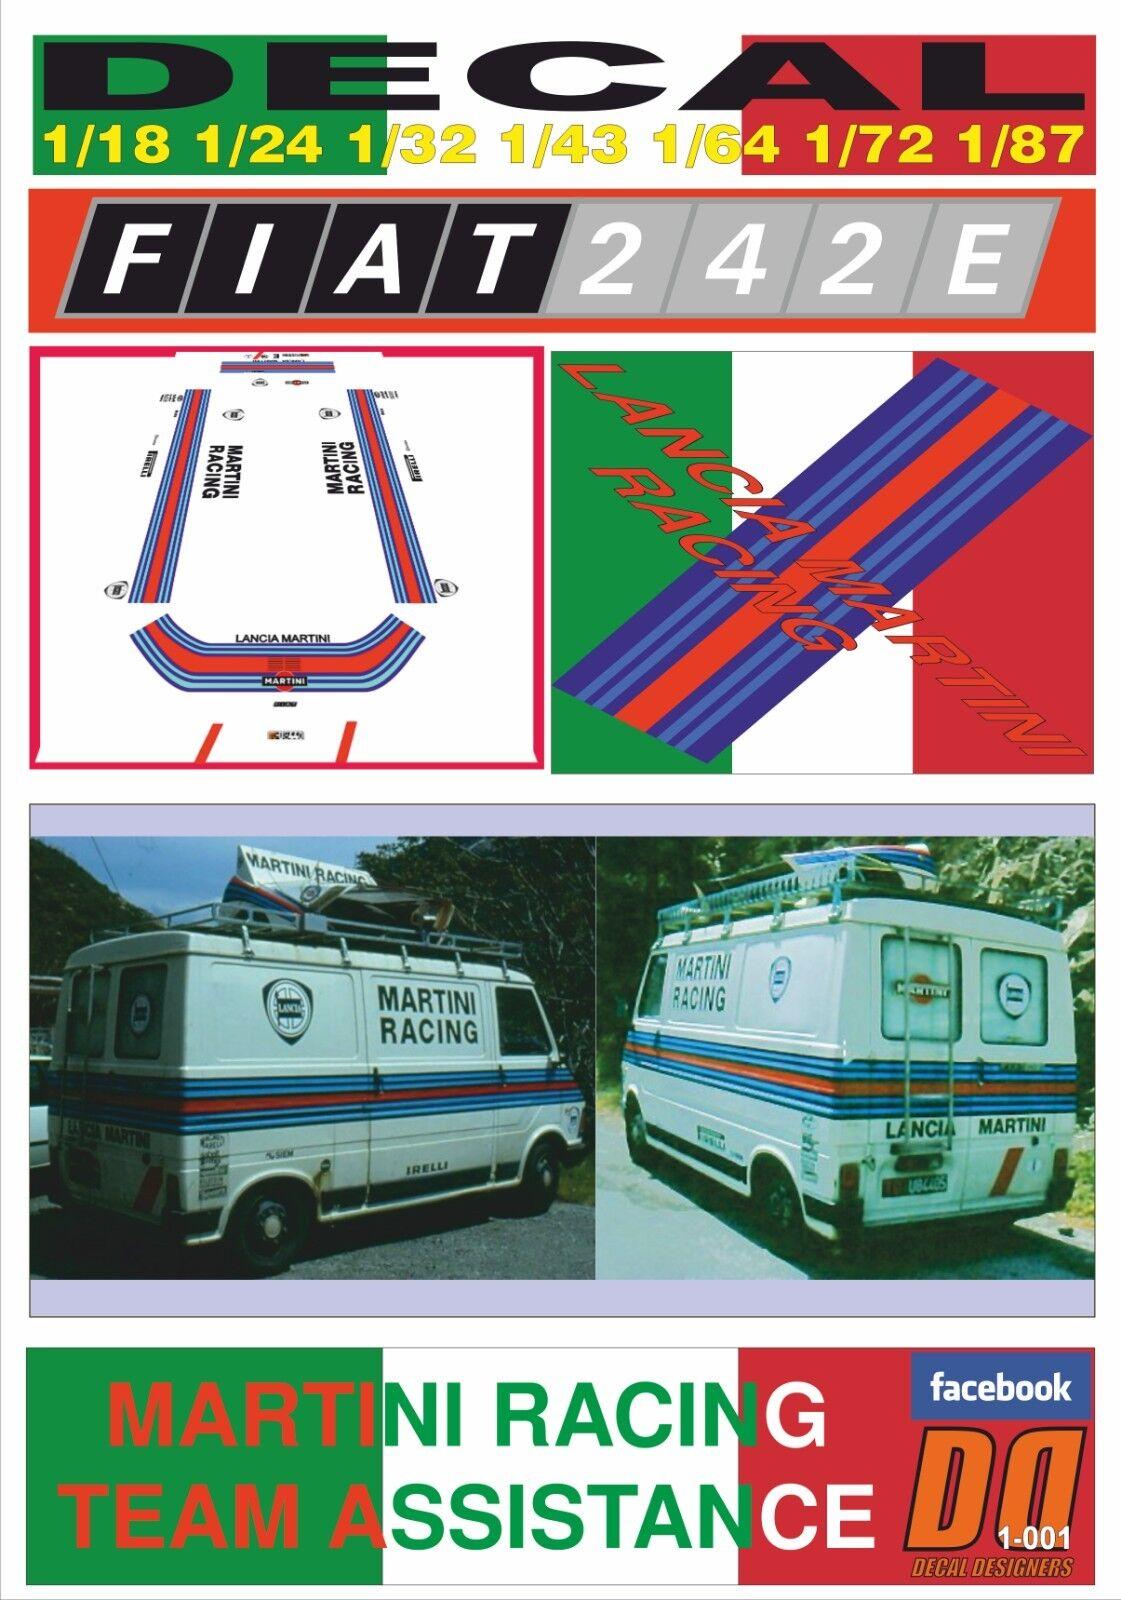 DECAL FIAT 242 E MARTINI RACING TEAM TEAM TEAM ASSISTANCE (03) 50fb92